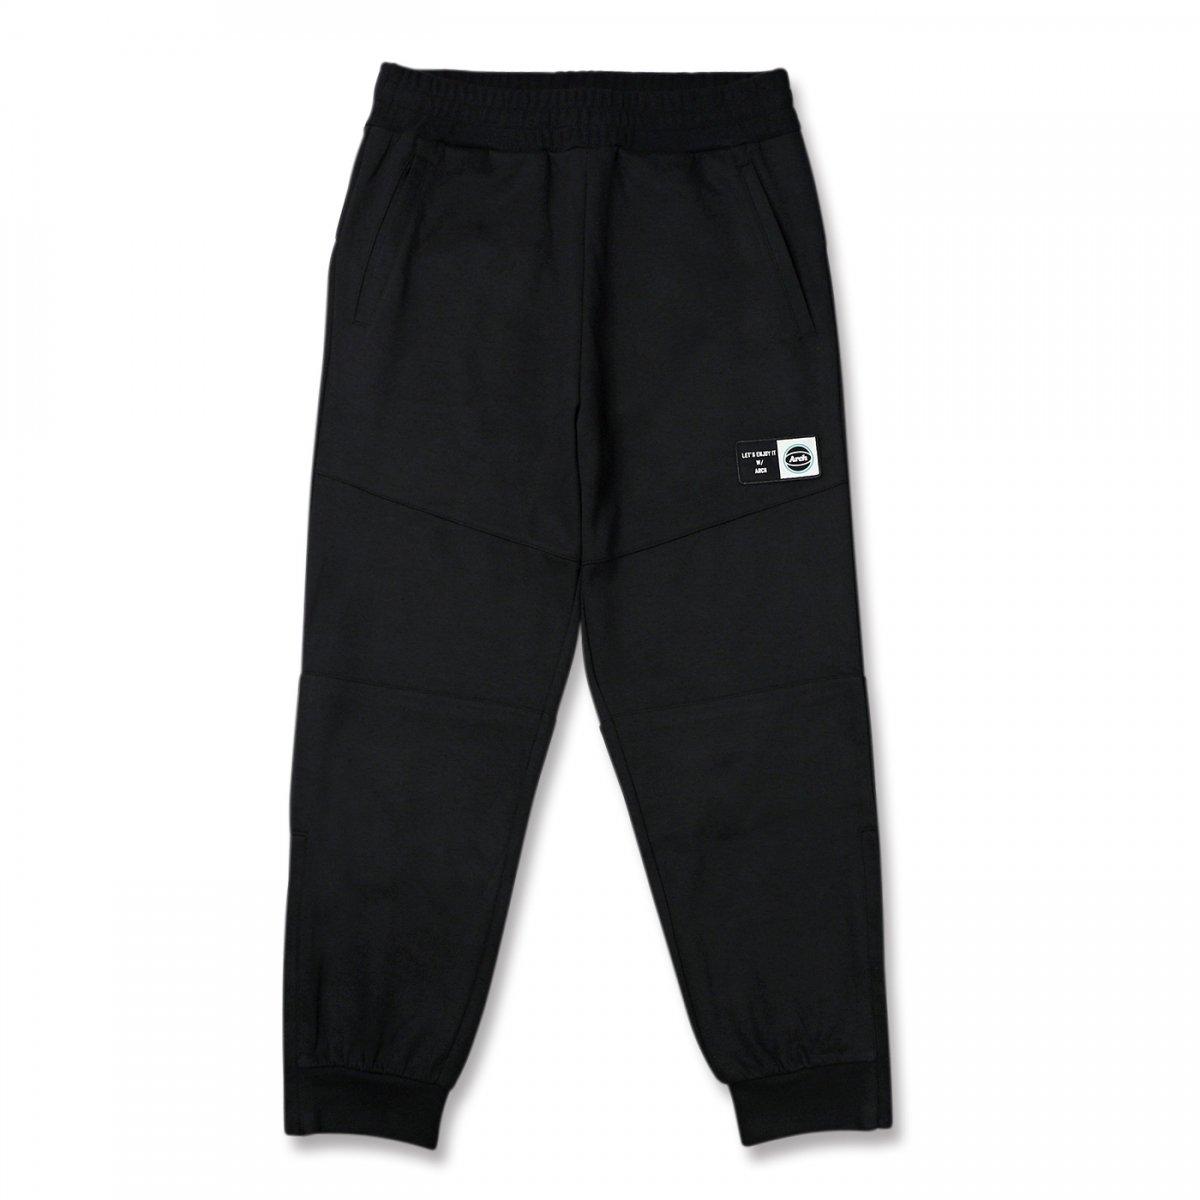 sport jogger pants【black】